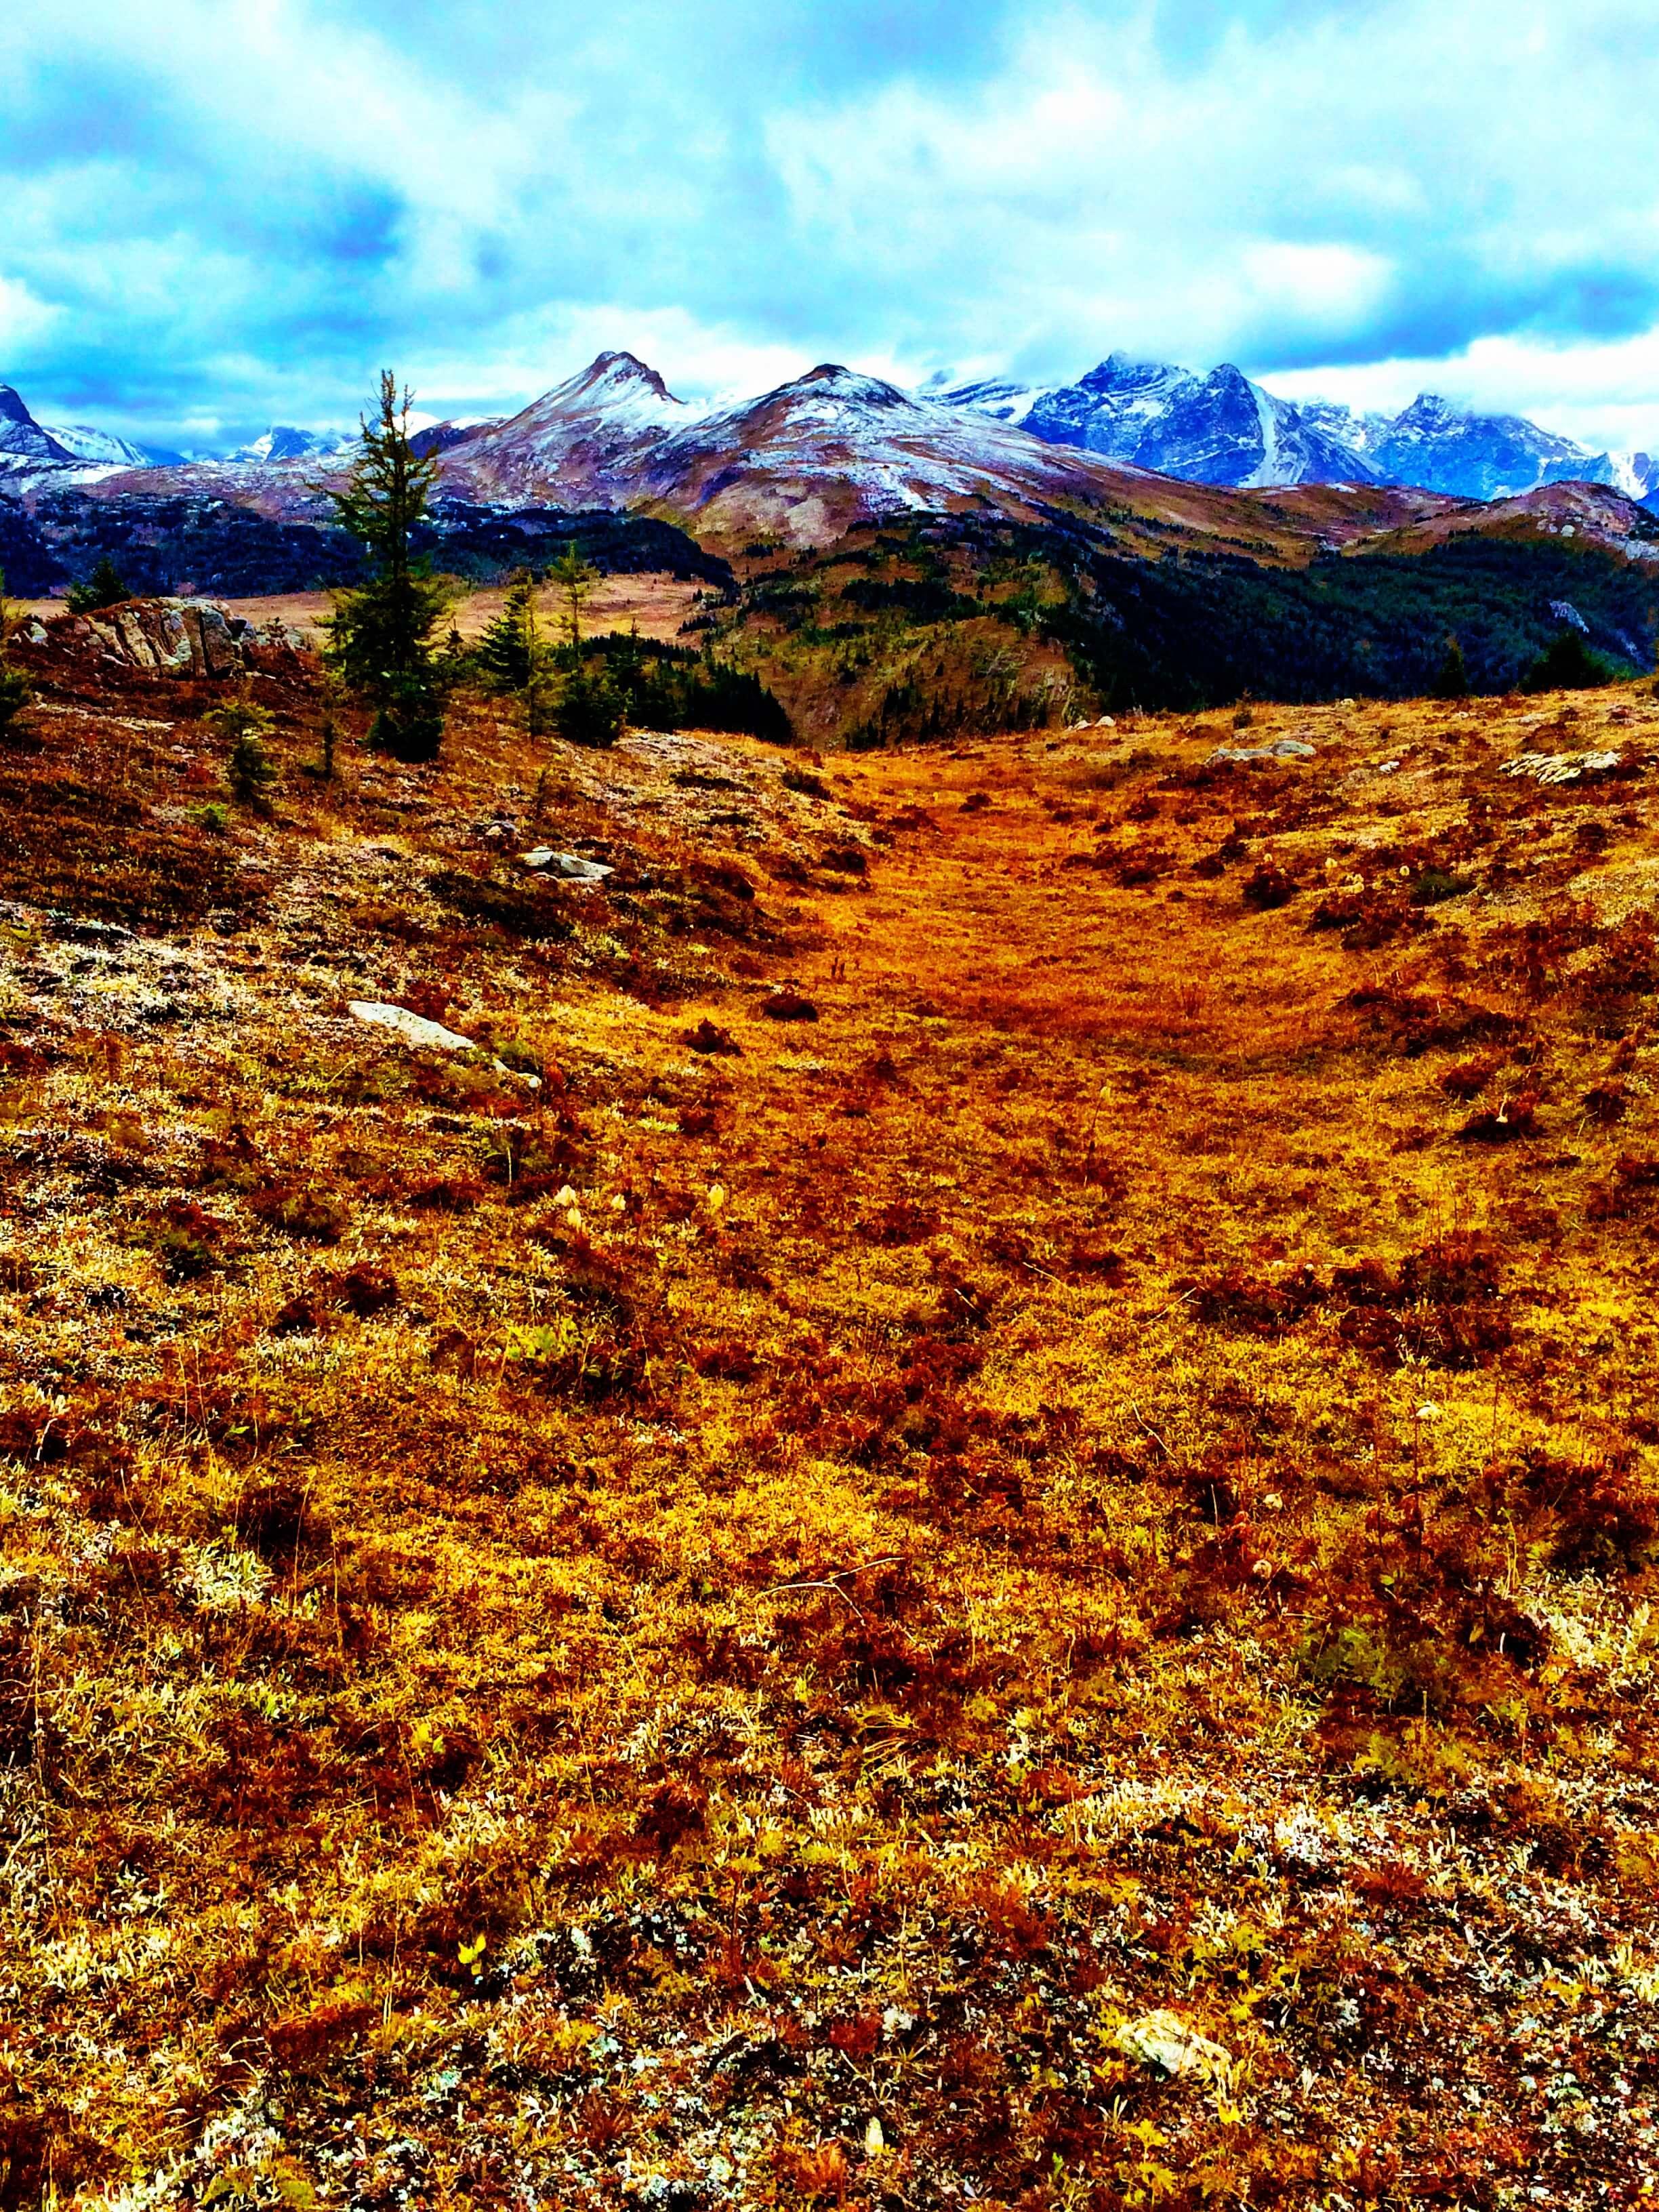 Sunshine Meadows, Alberta, Canada, September 2015